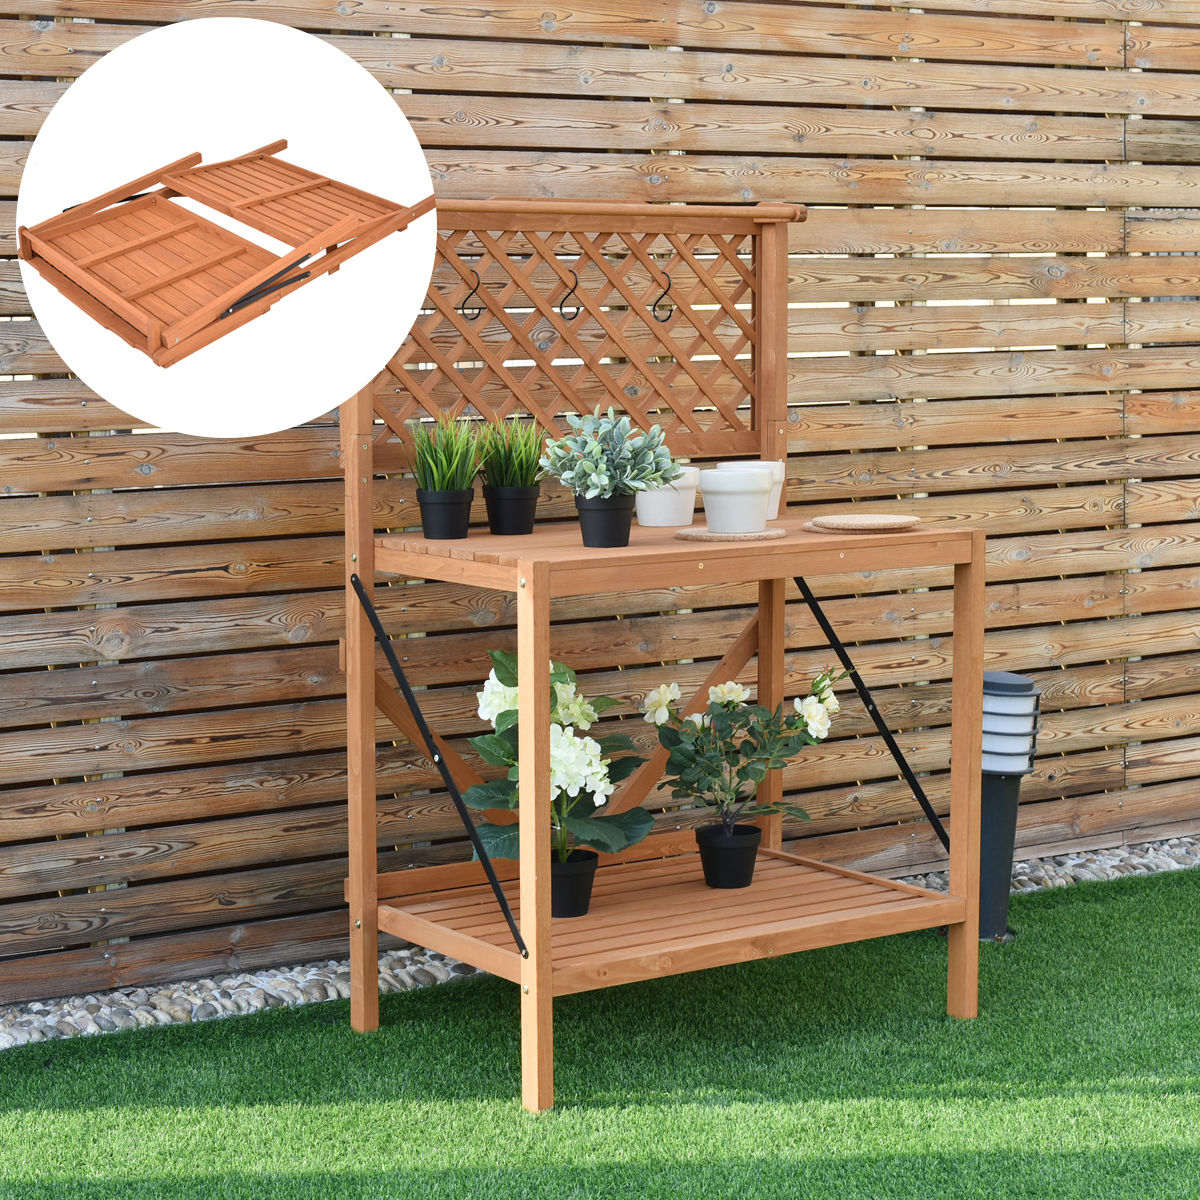 Costway Folding Wood Potting Bench Planting Workstation Shelf W/Top Handing Bar & Hook